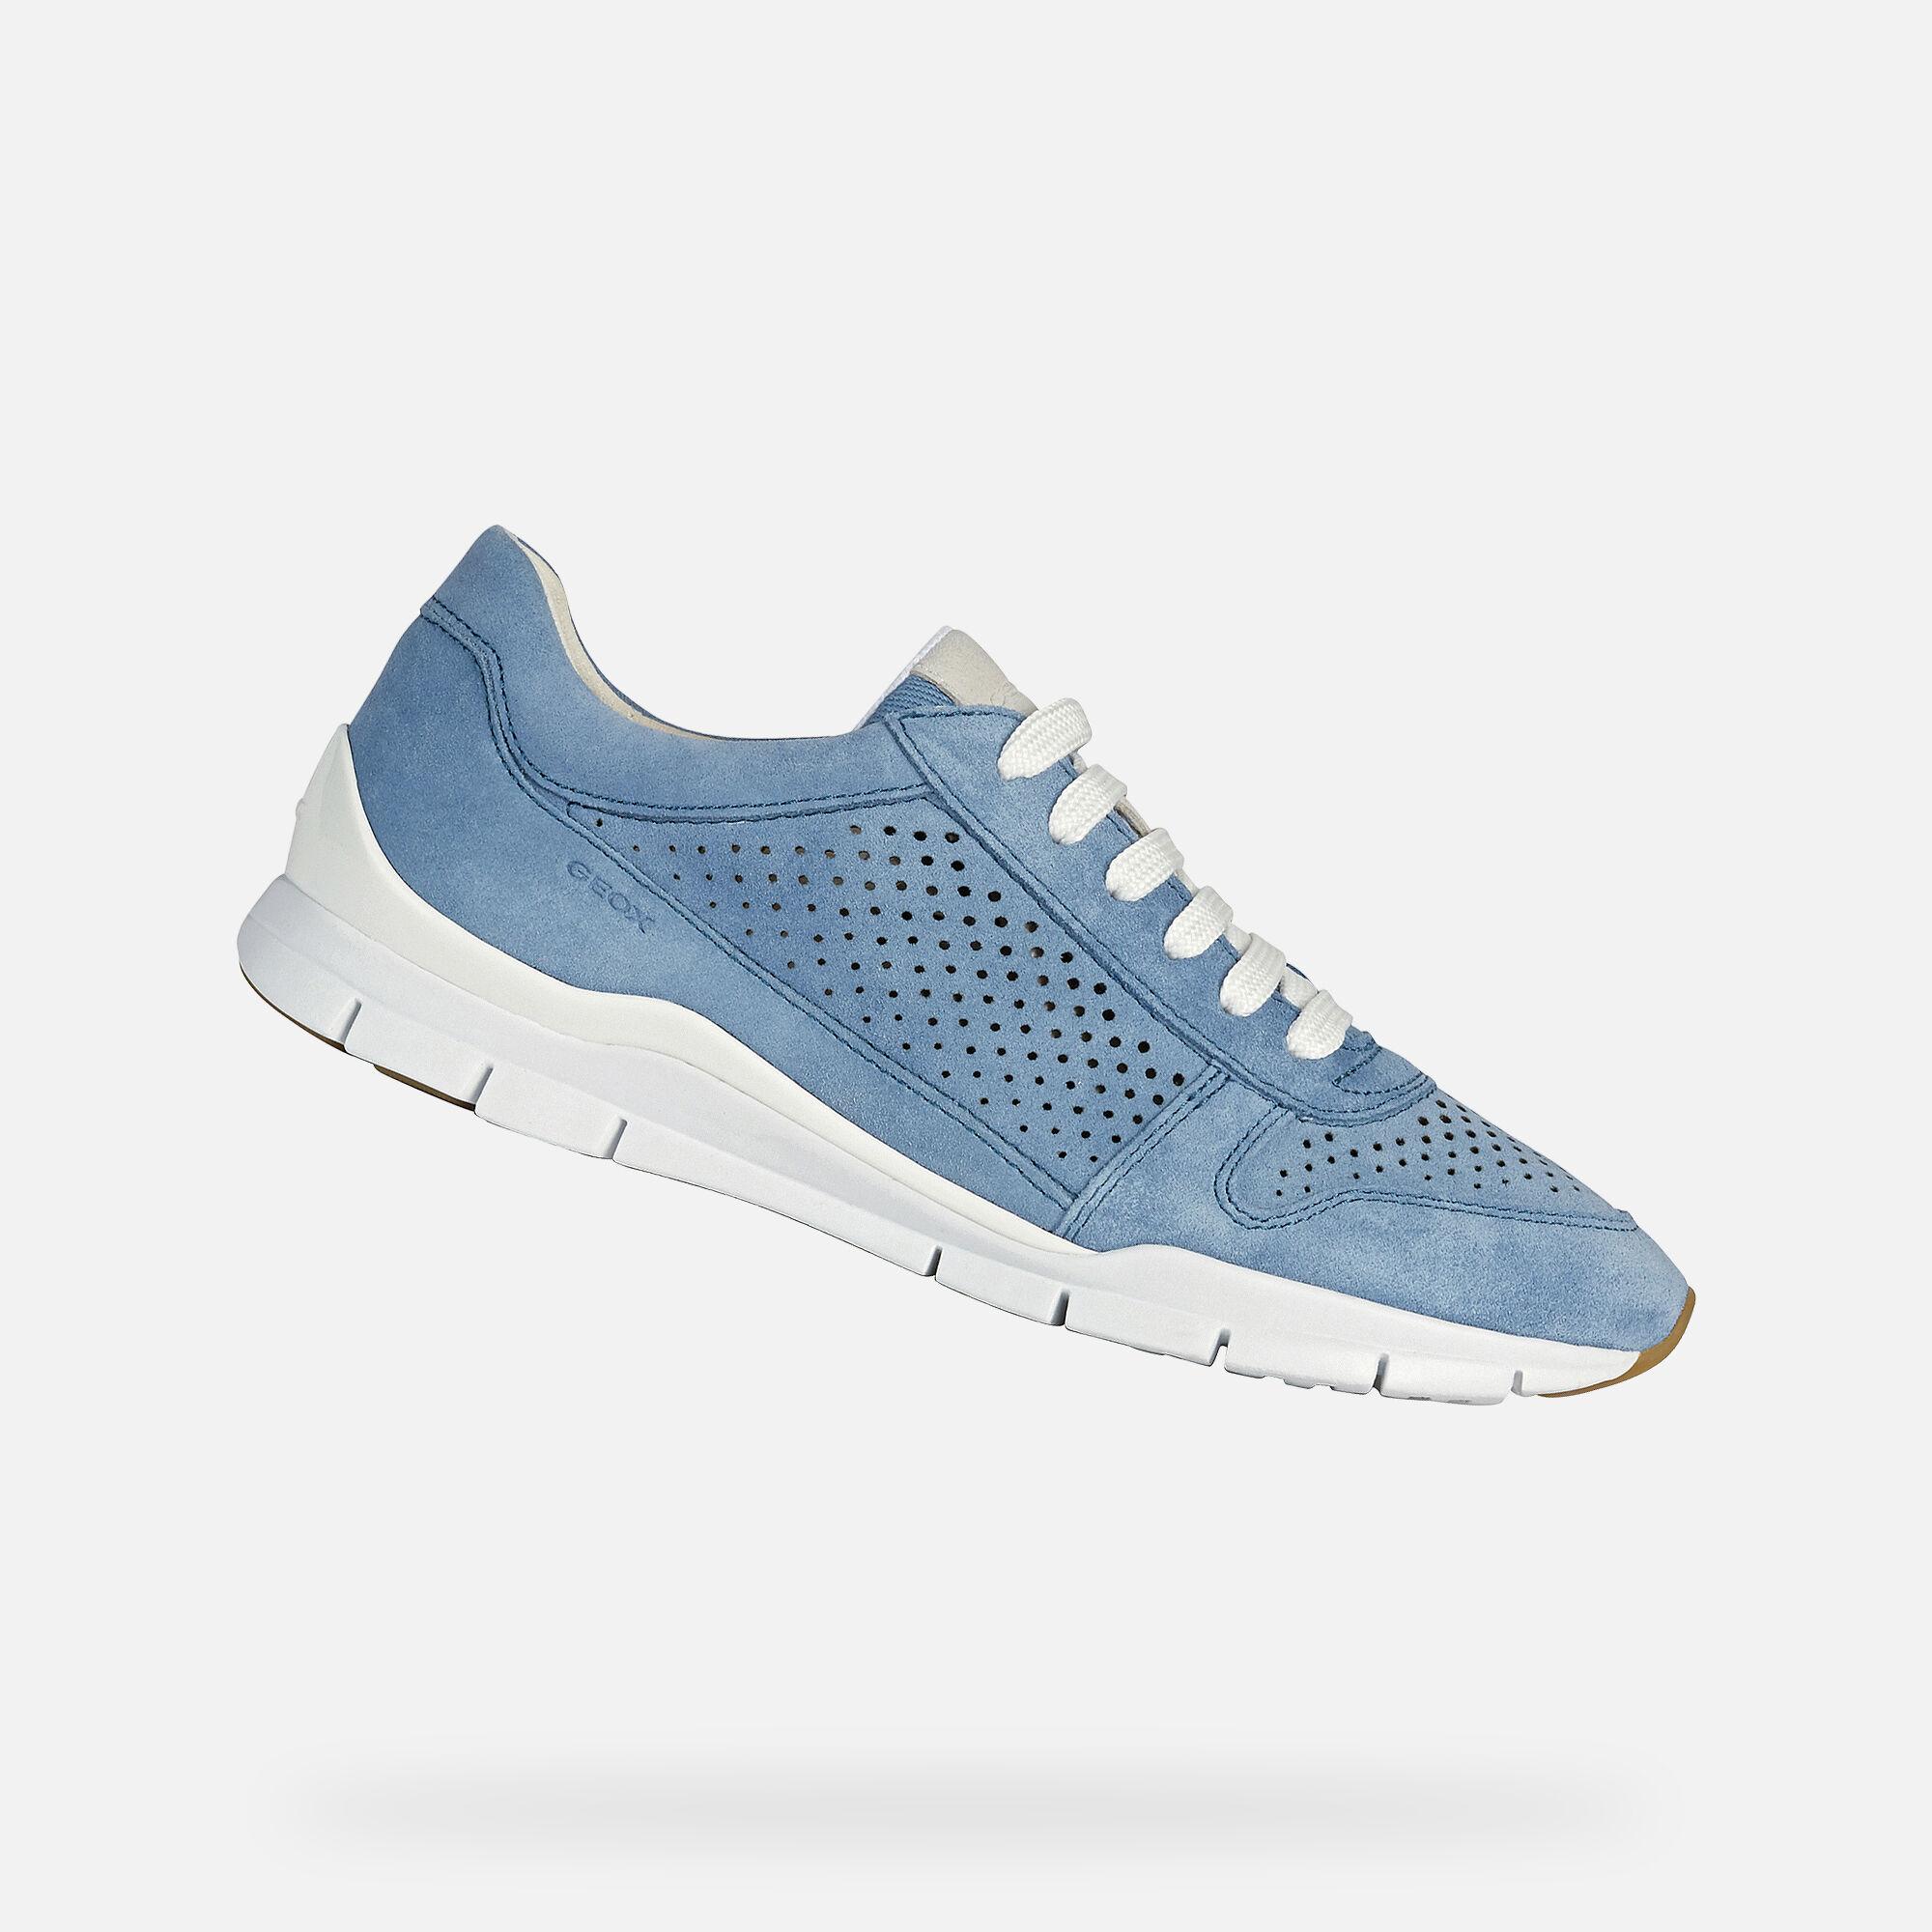 Geox SUKIE Woman: Lt Blue Sneakers